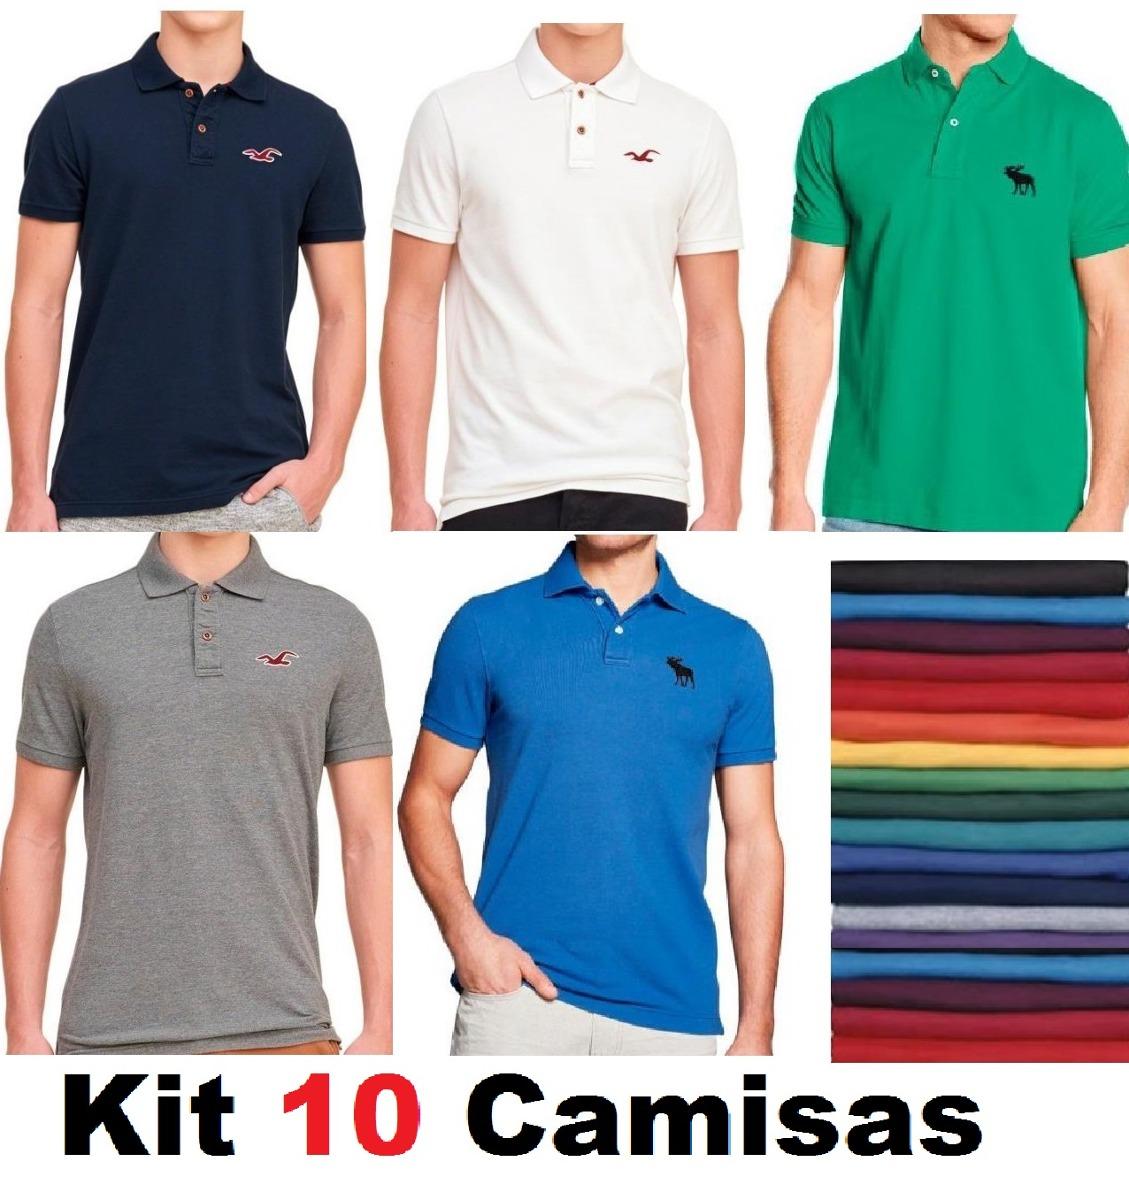 007c9d669d Kit C 10 Camisas Camisetas Atacado Gola Polo Masculina Marc - R  182 ...